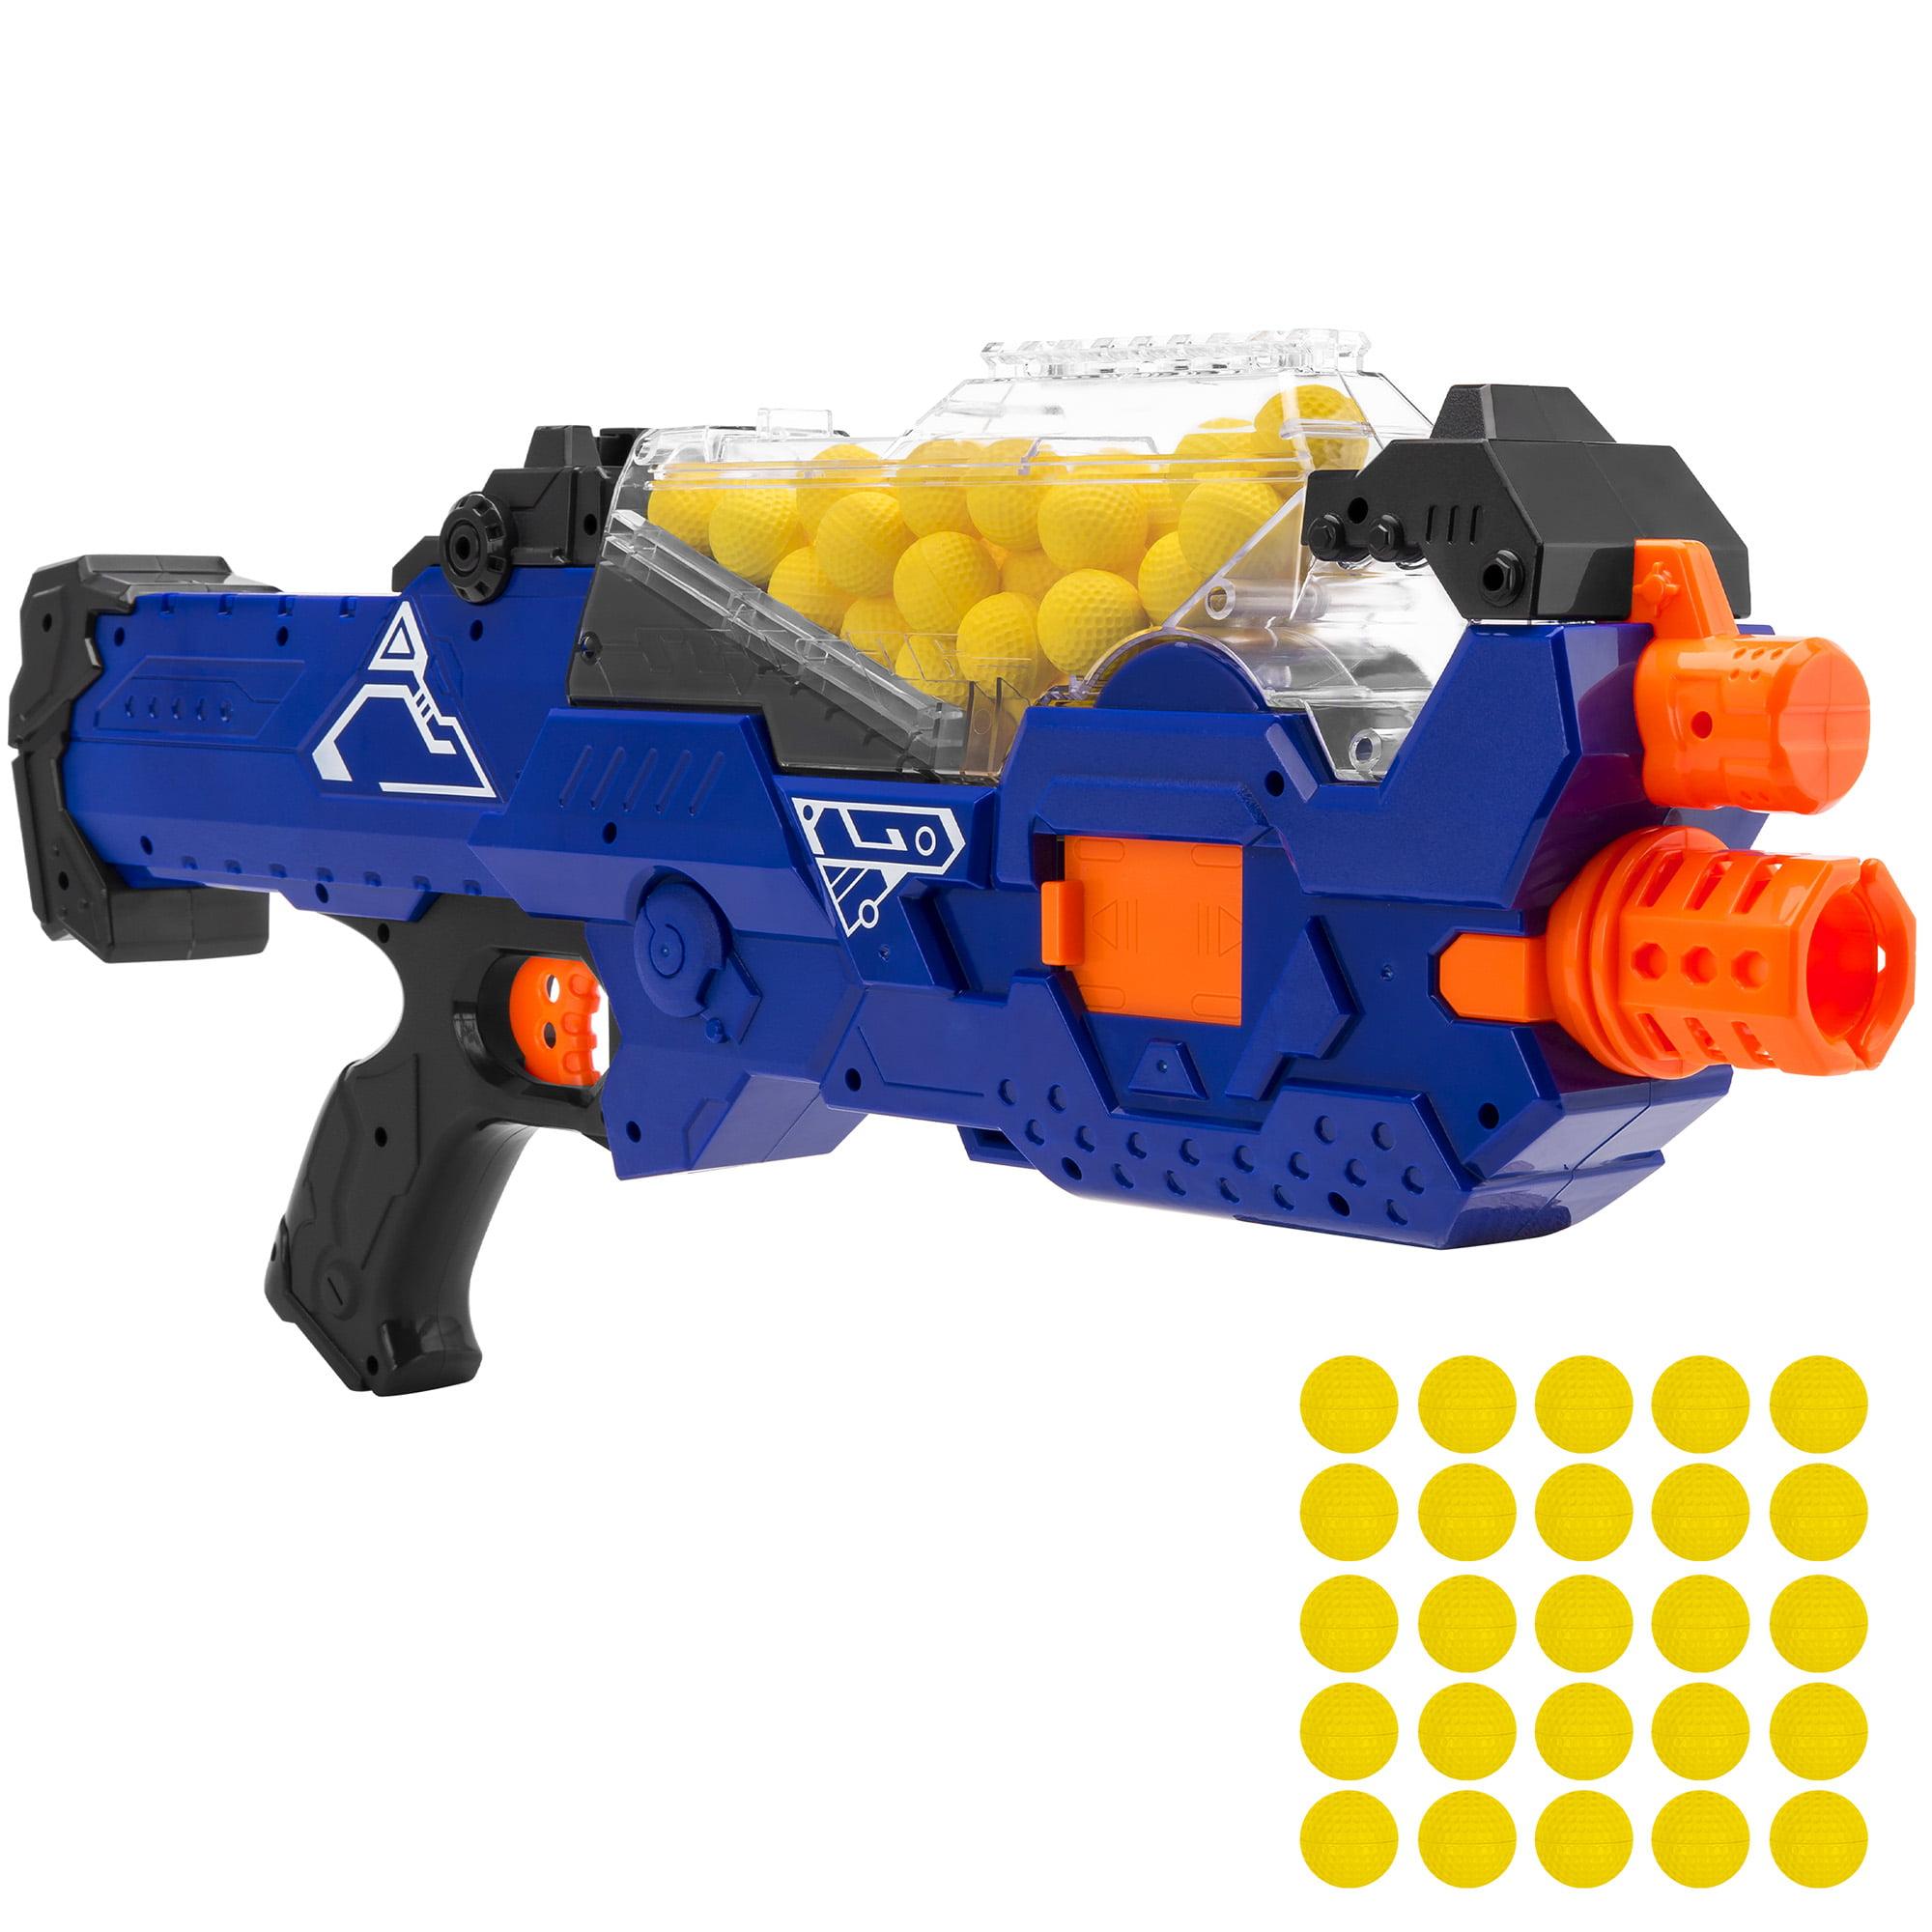 LEGO LOT OF 8 DARK BLUISH GREY SHOOTING CANNON PIECES BLASTERS SPRING GUNS